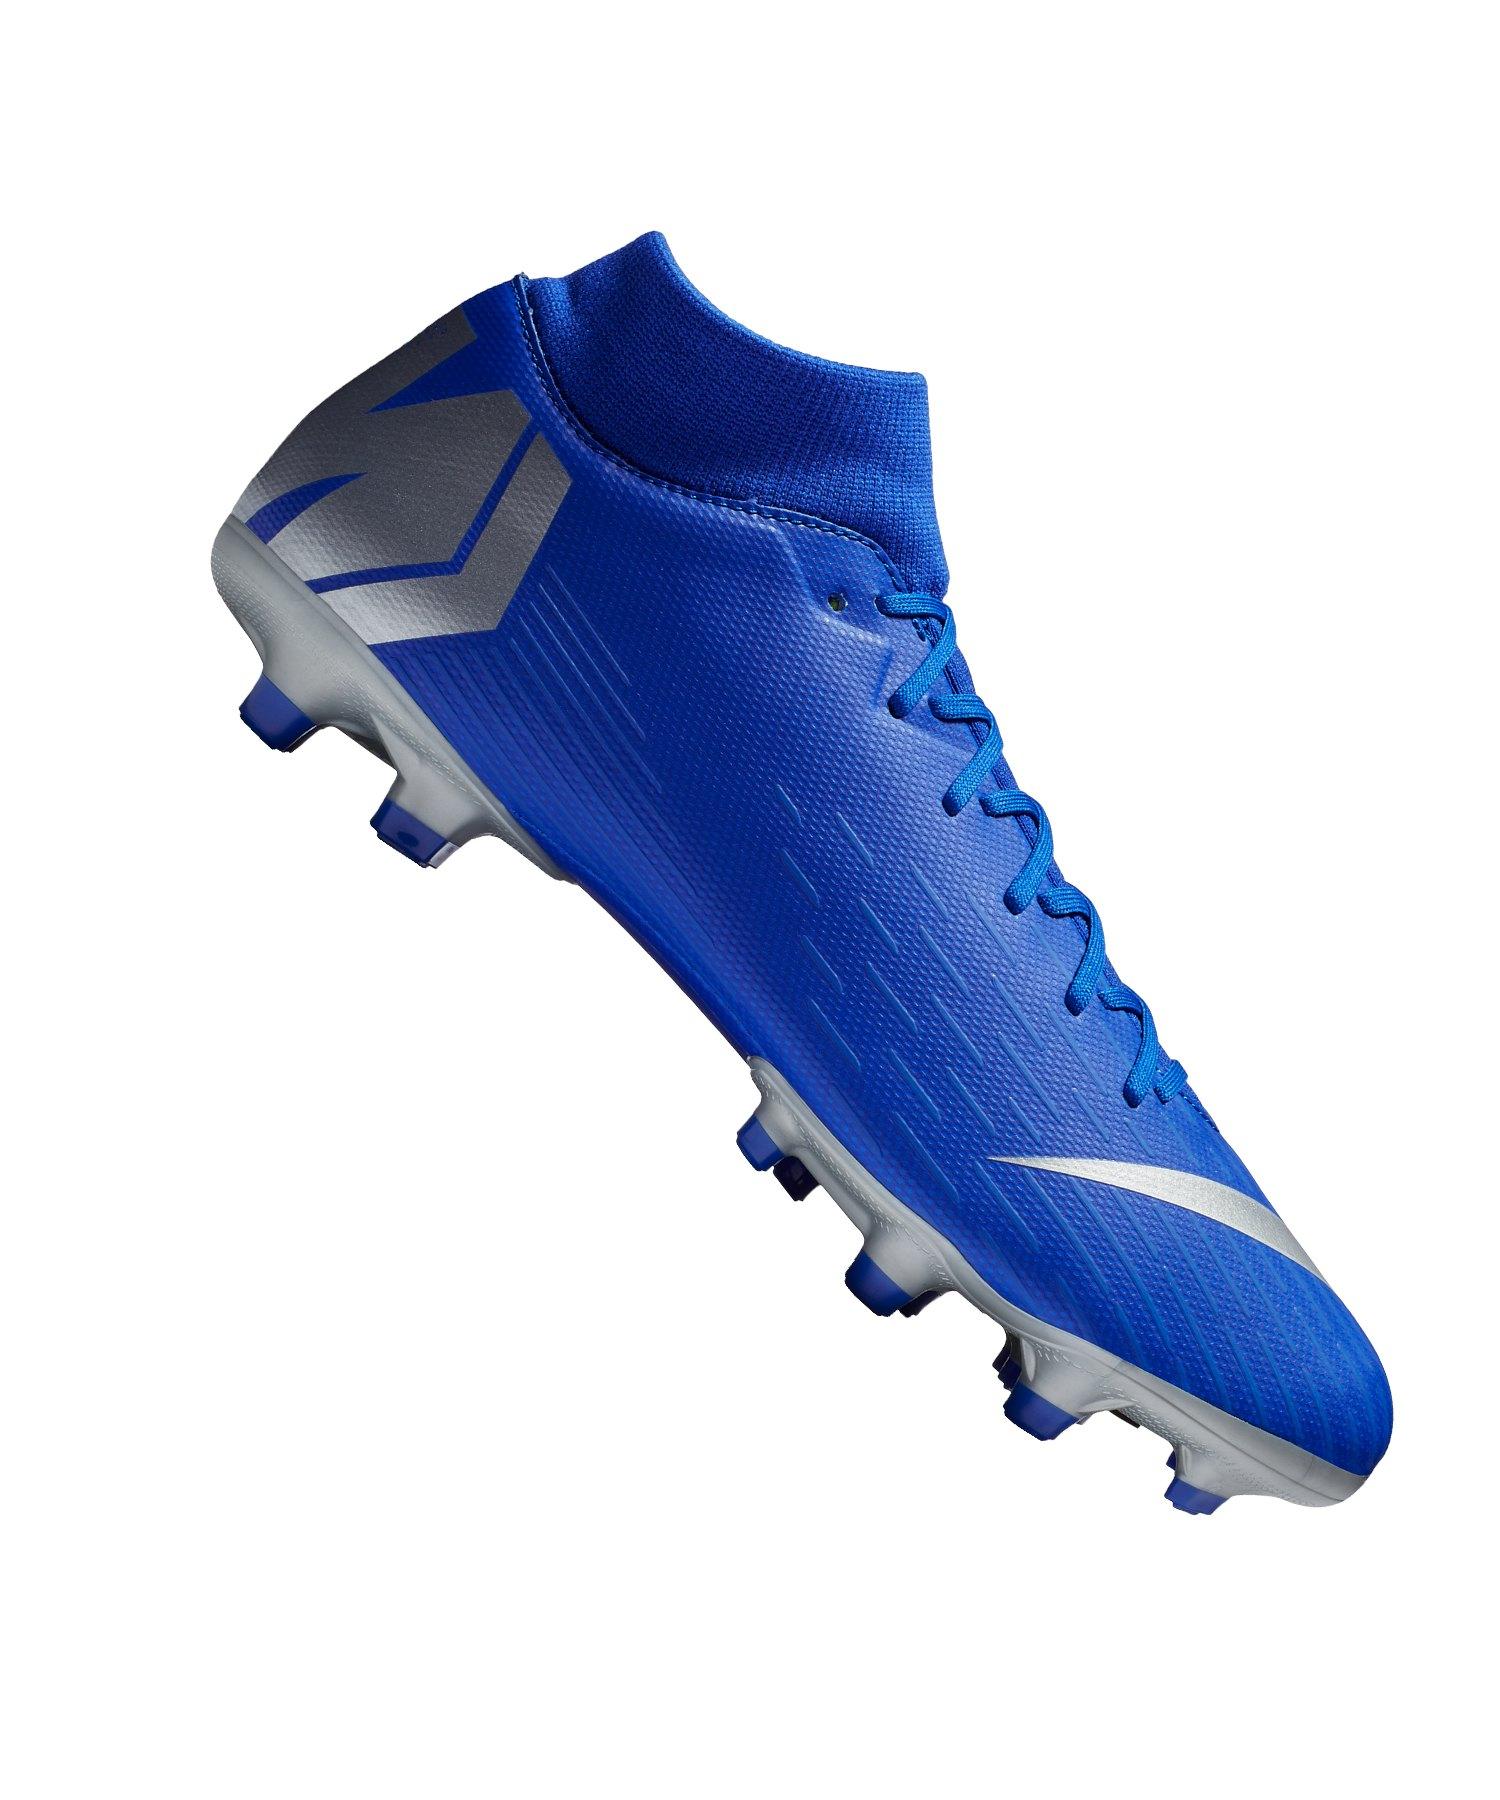 Nike Mercurial Superfly VI Academy MG Blau F400 - blau